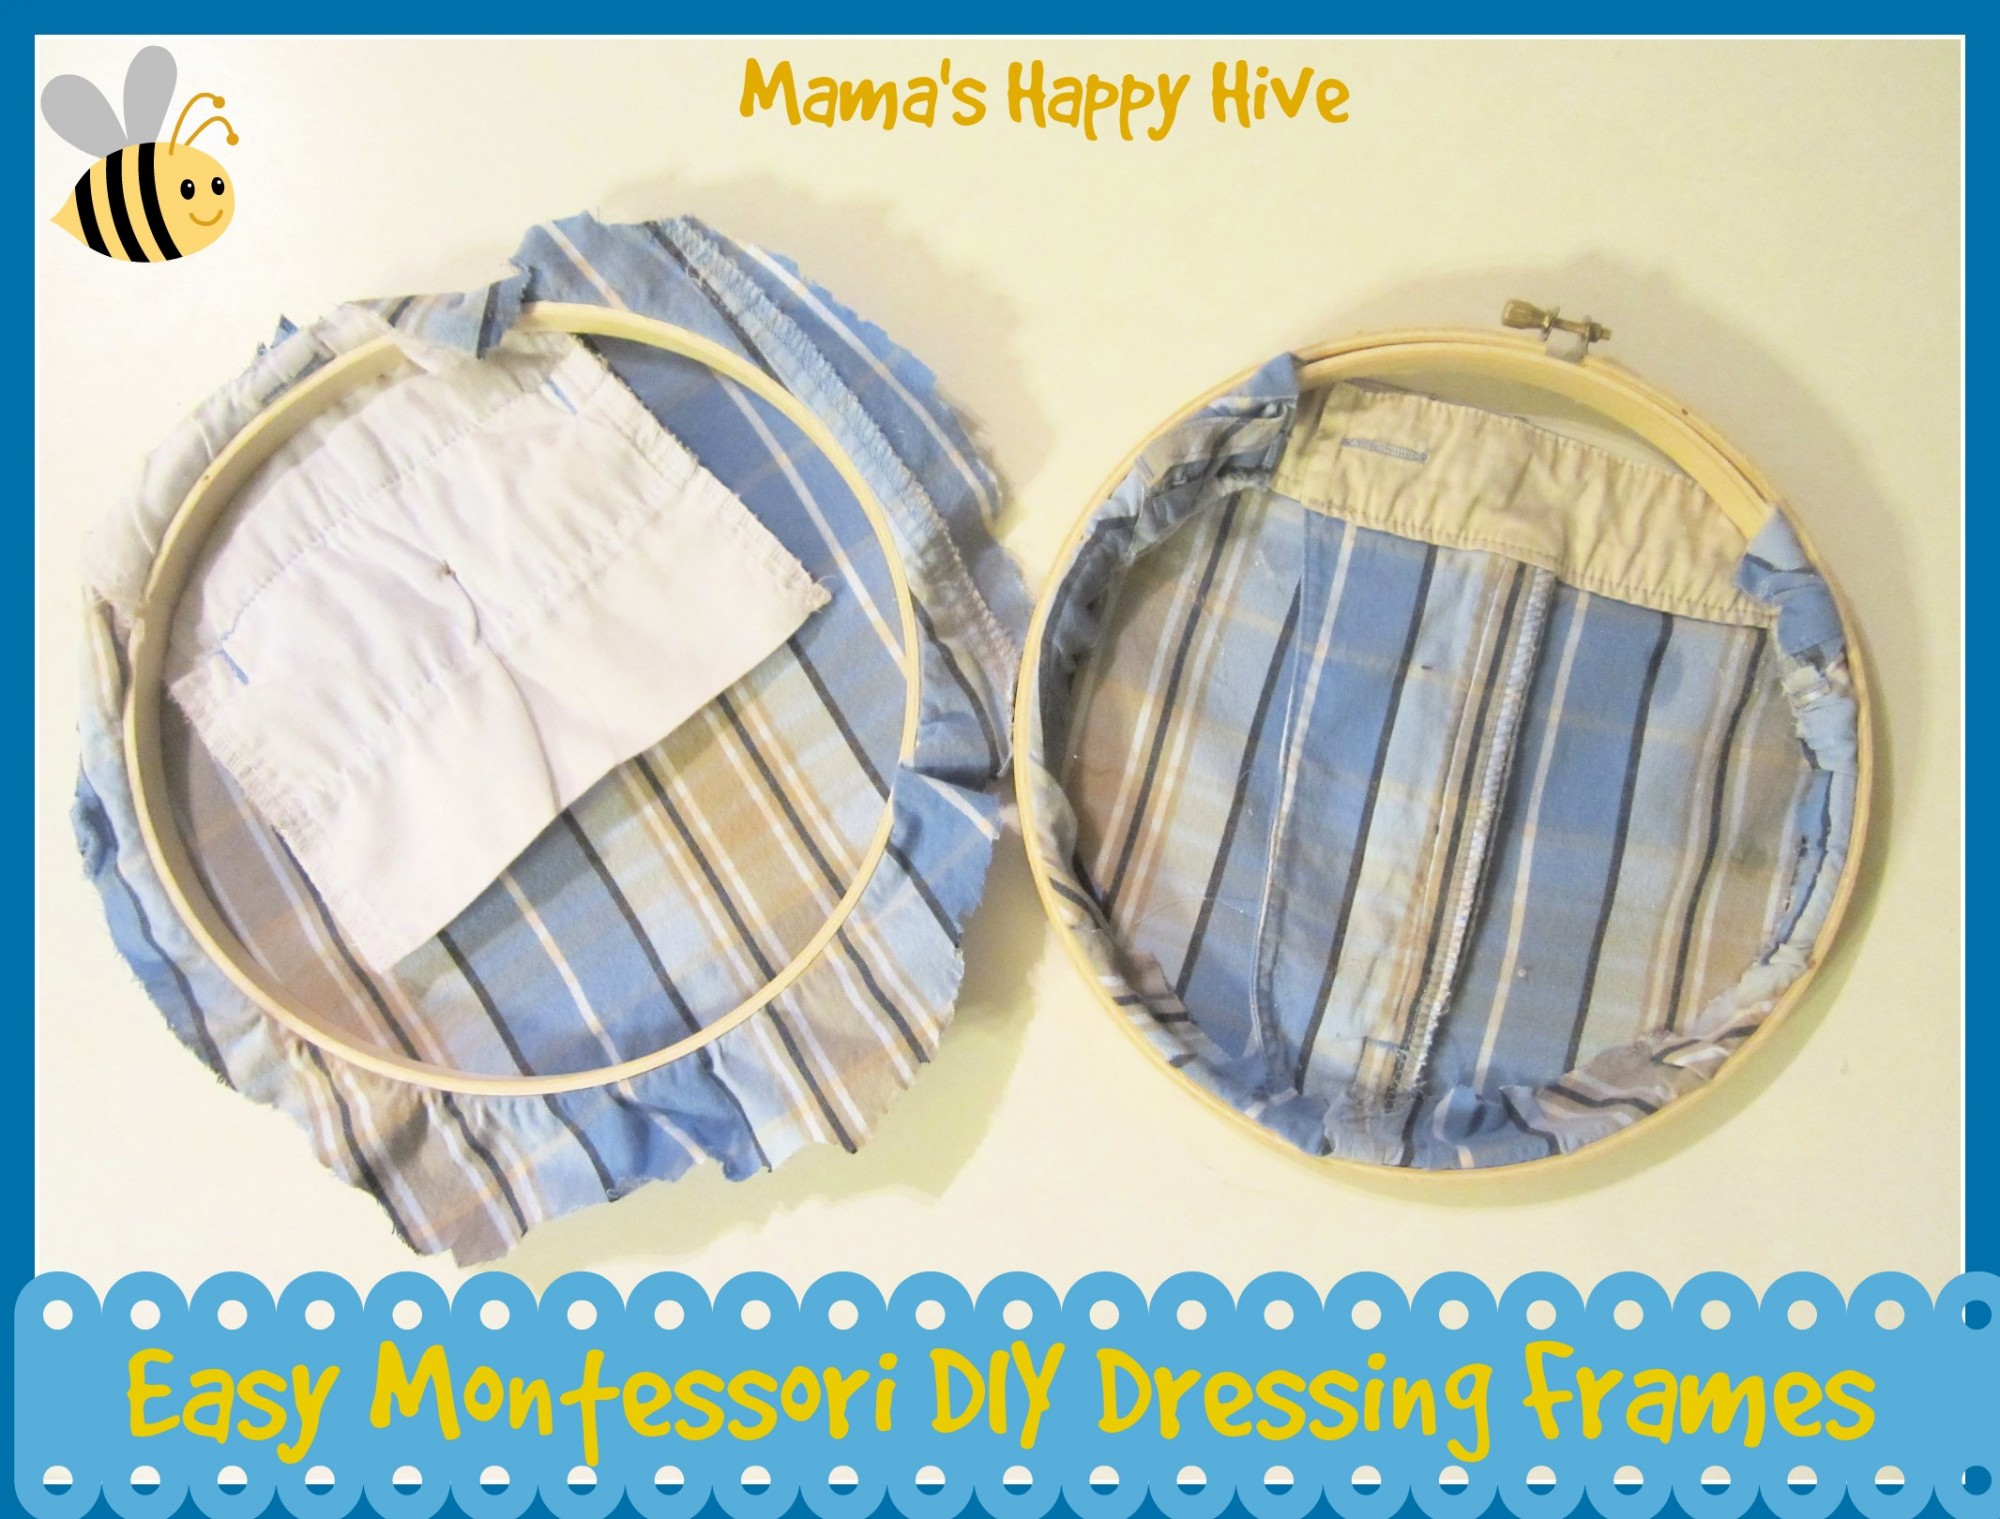 Easy DIY Montessori Dressing Frames - www.mamashappyhive.com